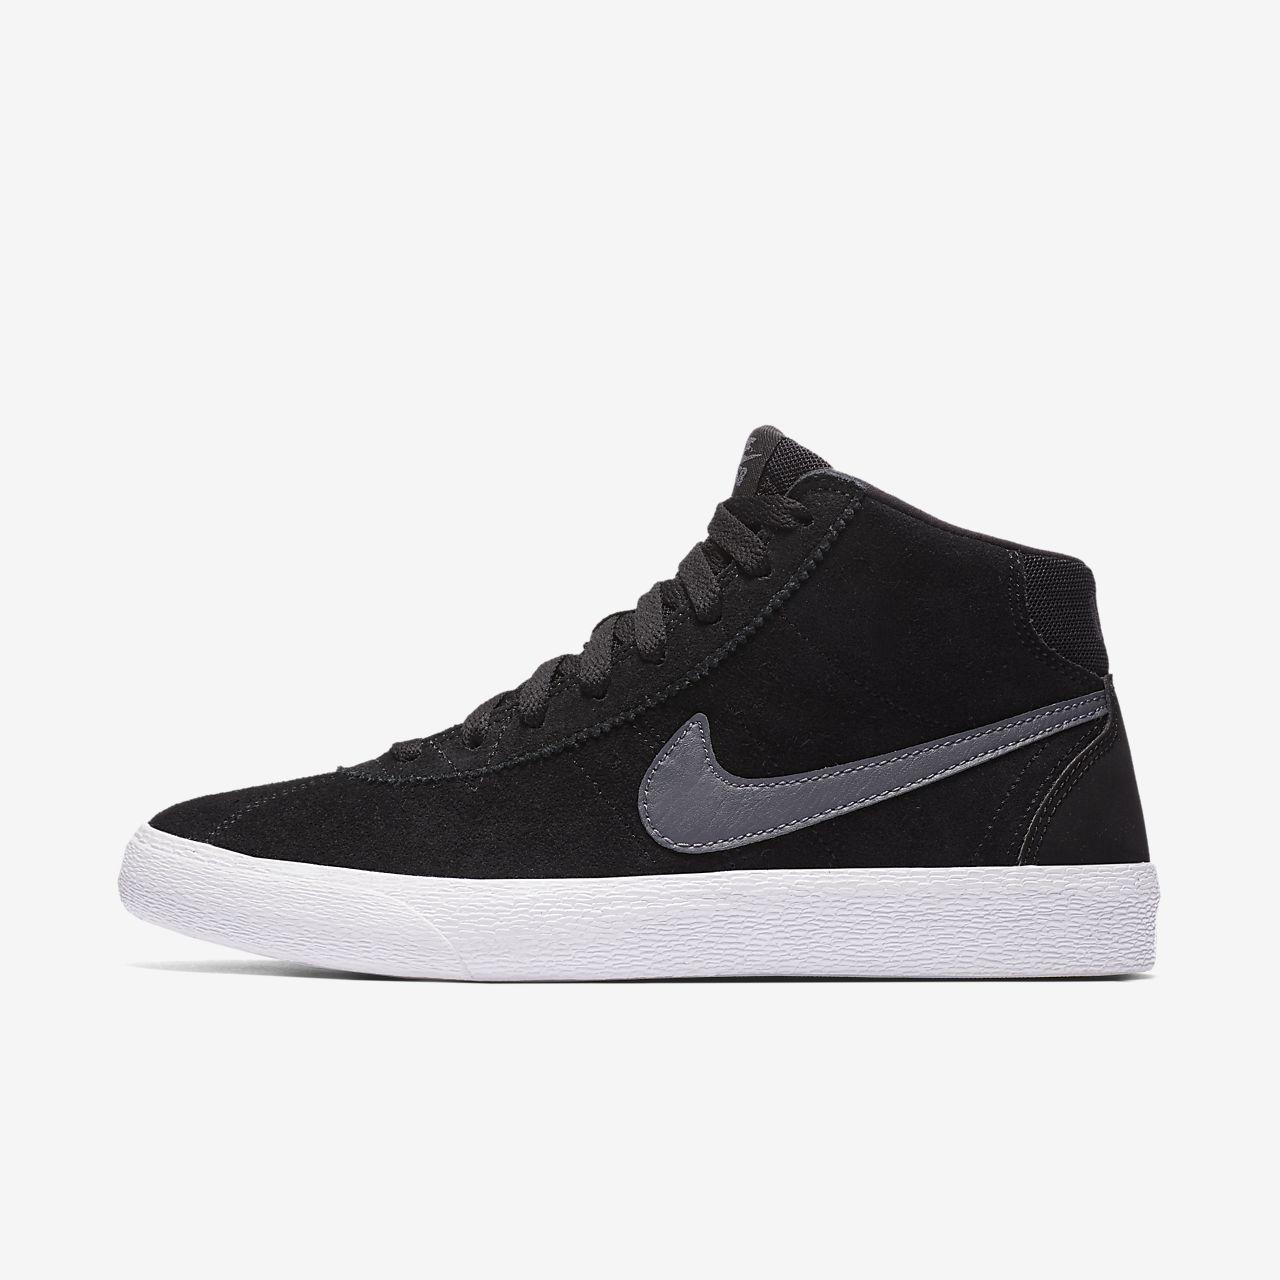 nike skate shoes ... nike sb bruin high womenu0027s skateboarding shoe AIVIWTO